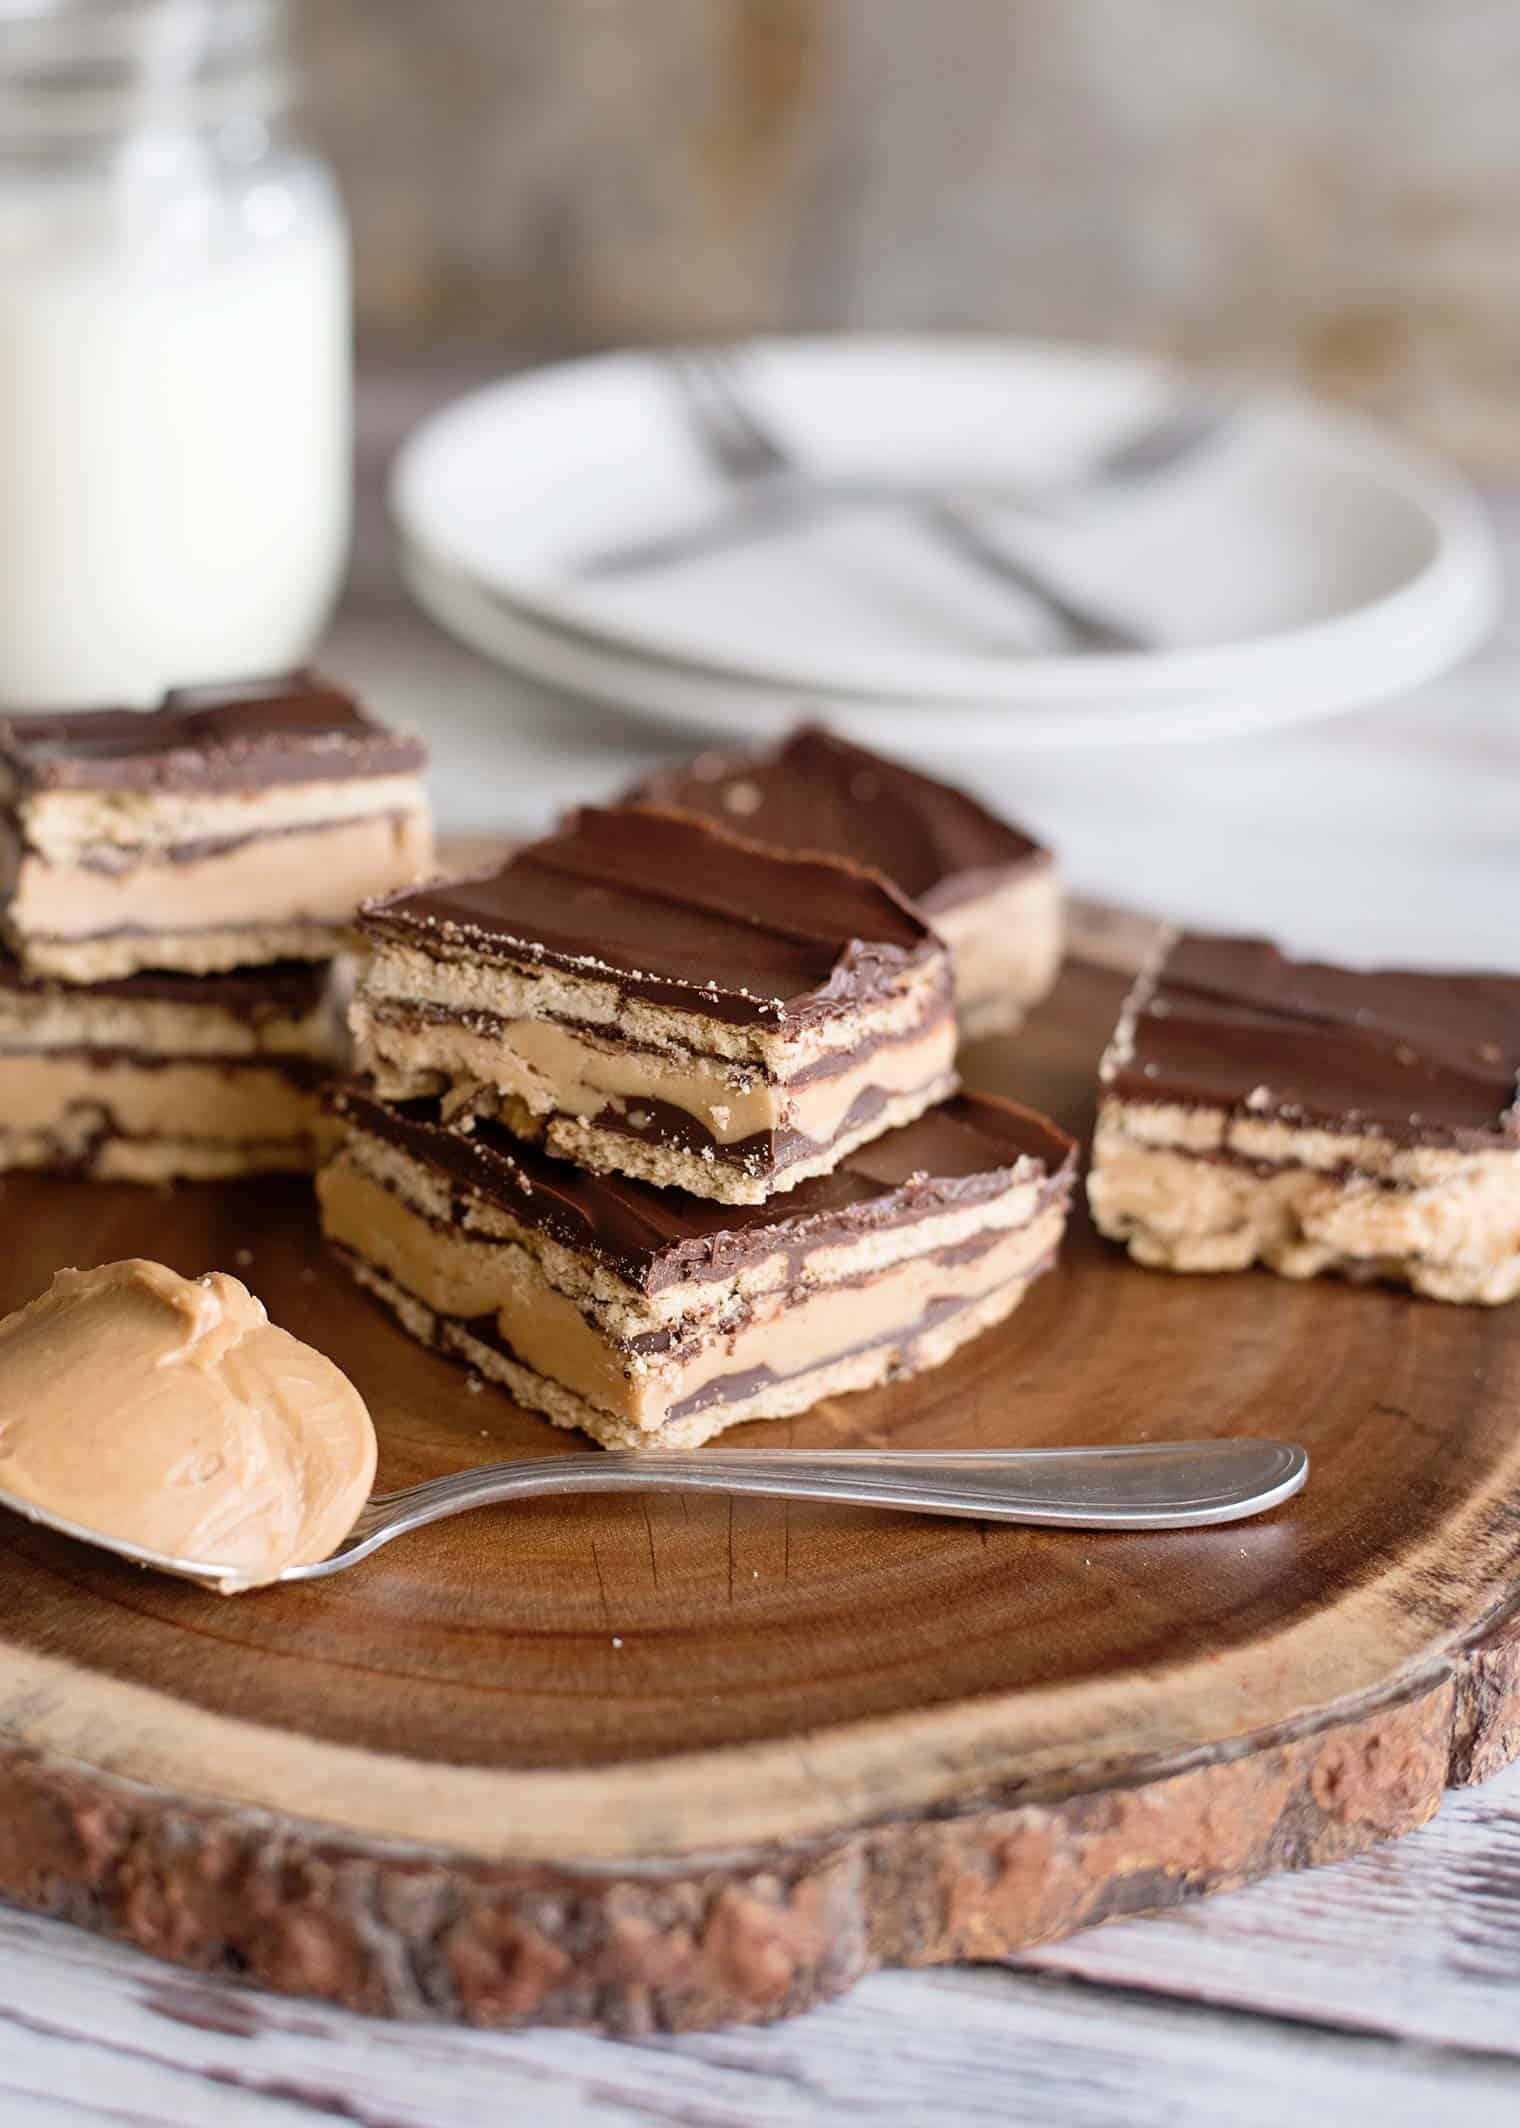 No-Bake Peanut Butter Patty Bars